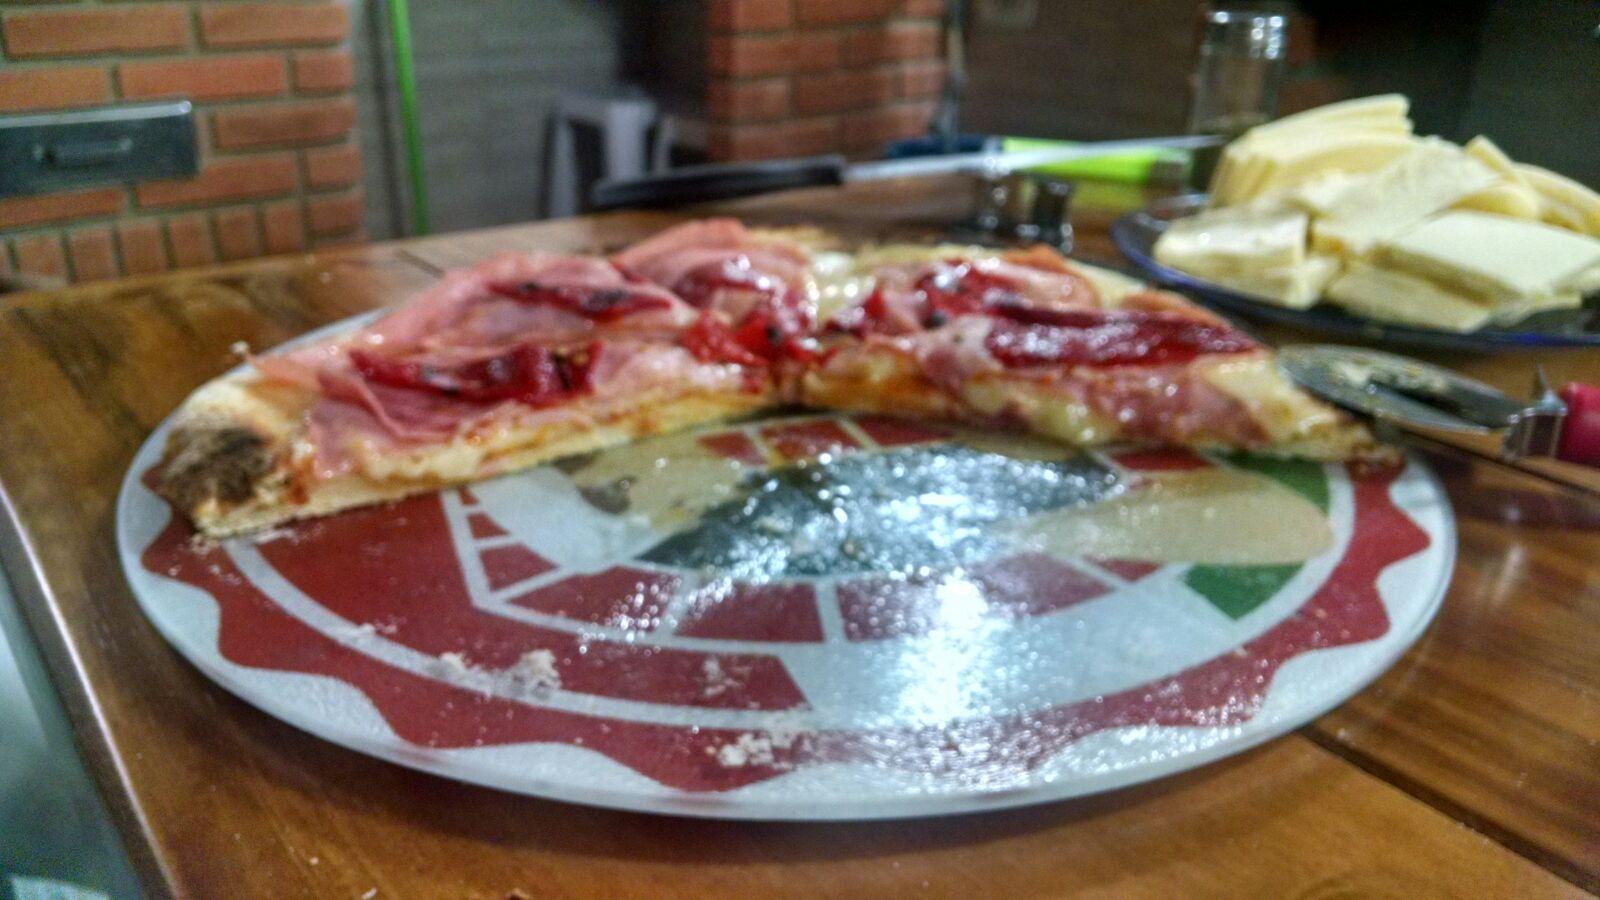 Forno PizzaGril da Itajobi - Página 2 T7g3kp